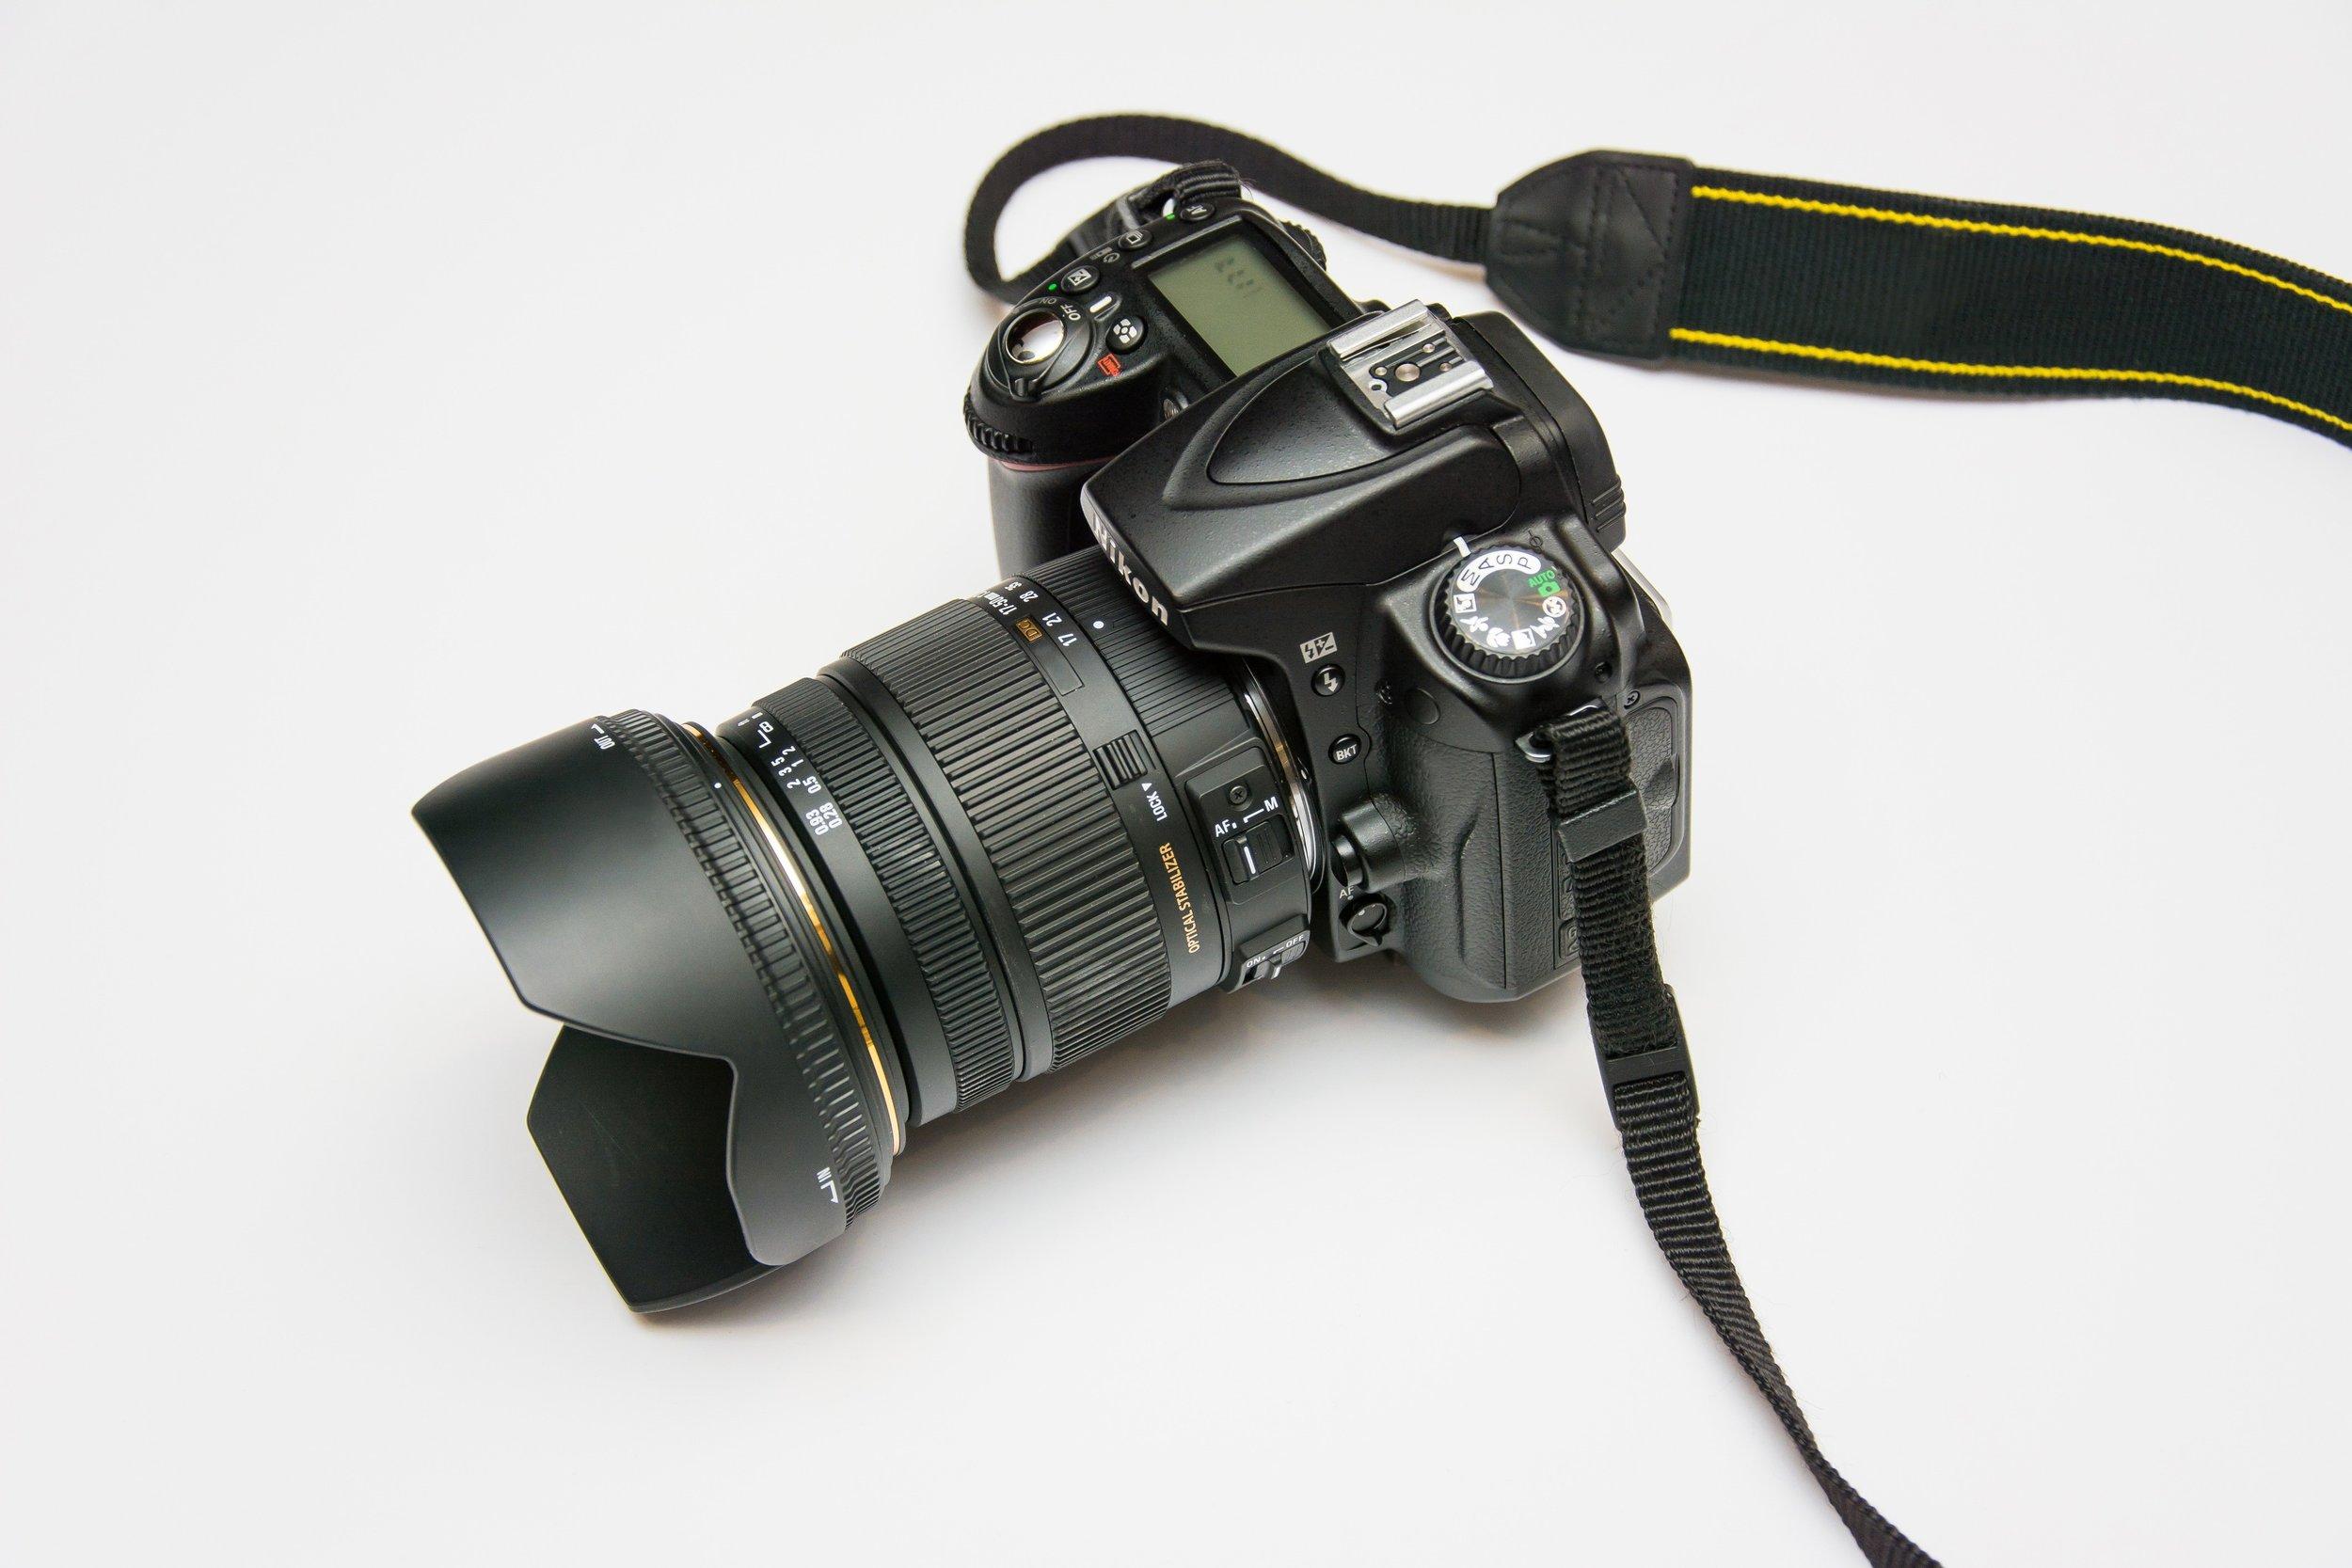 camera-dslr-electronics-51383.jpg